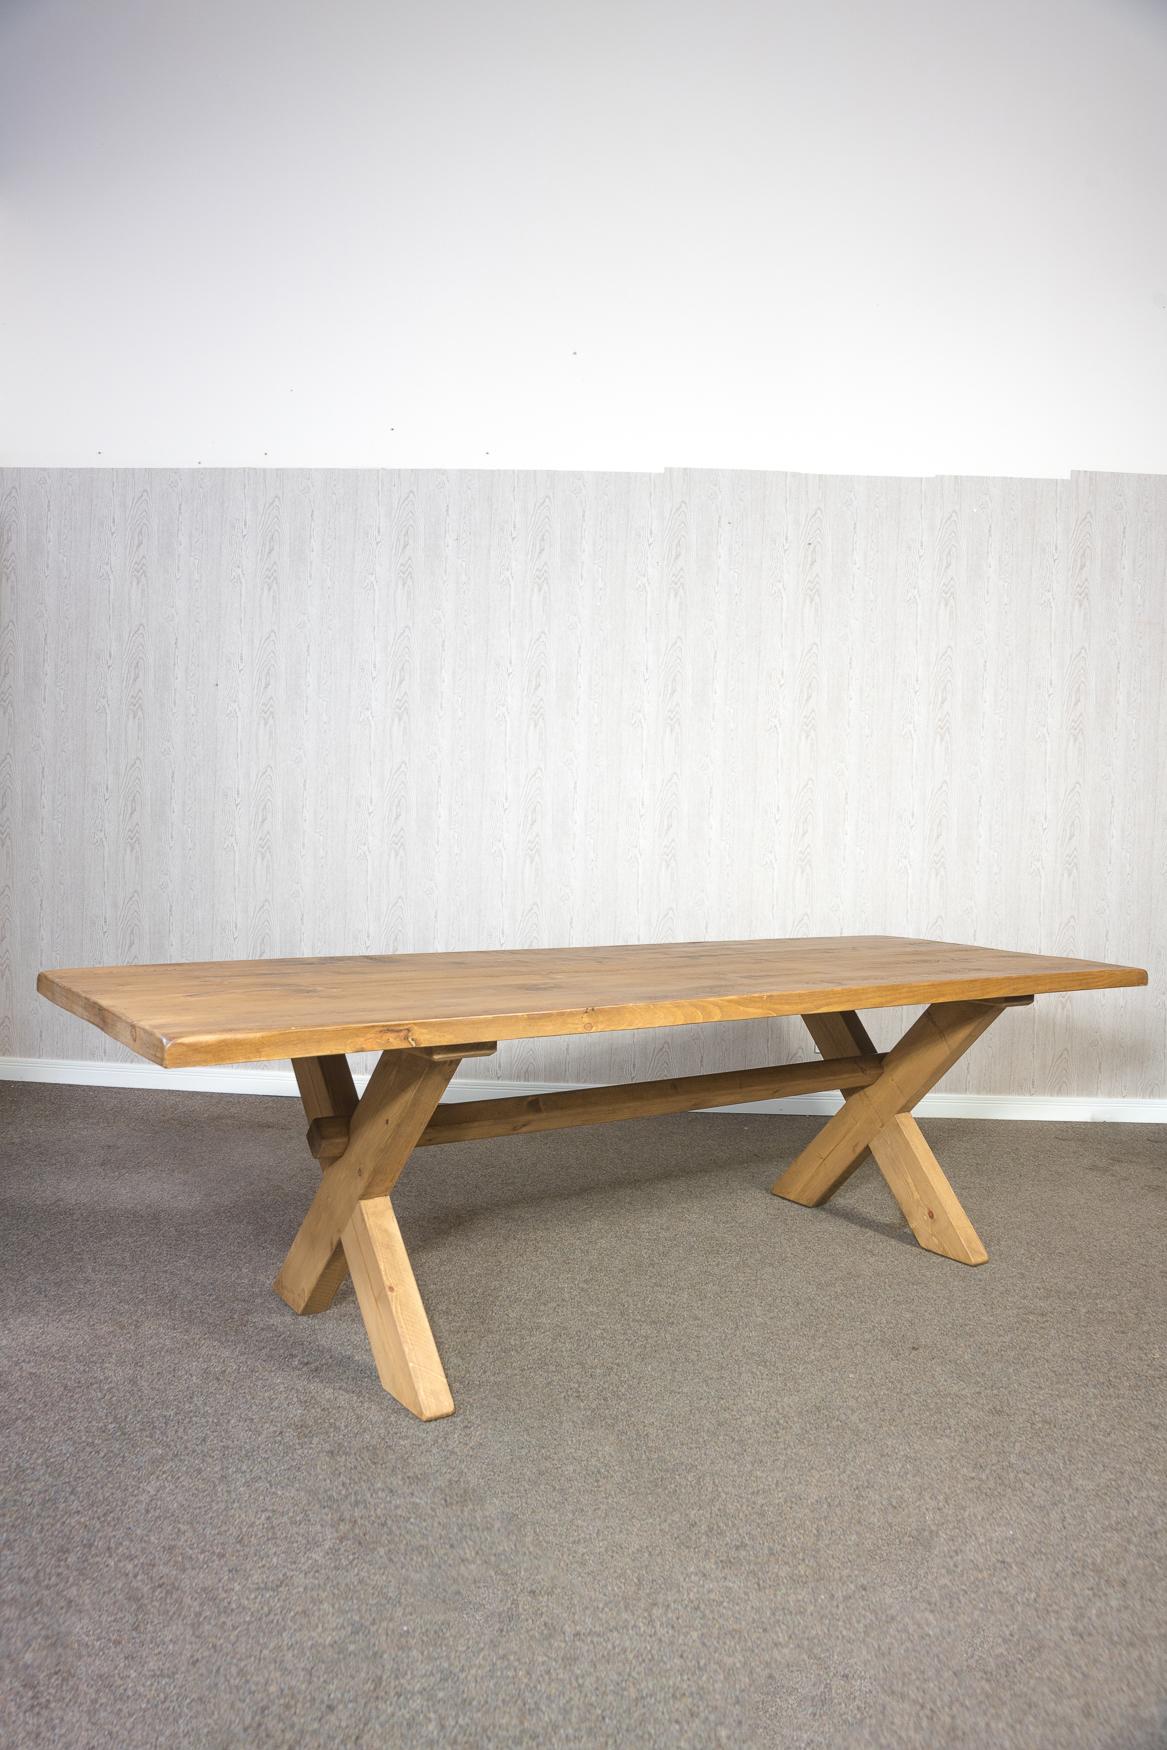 RUSTIC 2700mm X Leg Dining Table